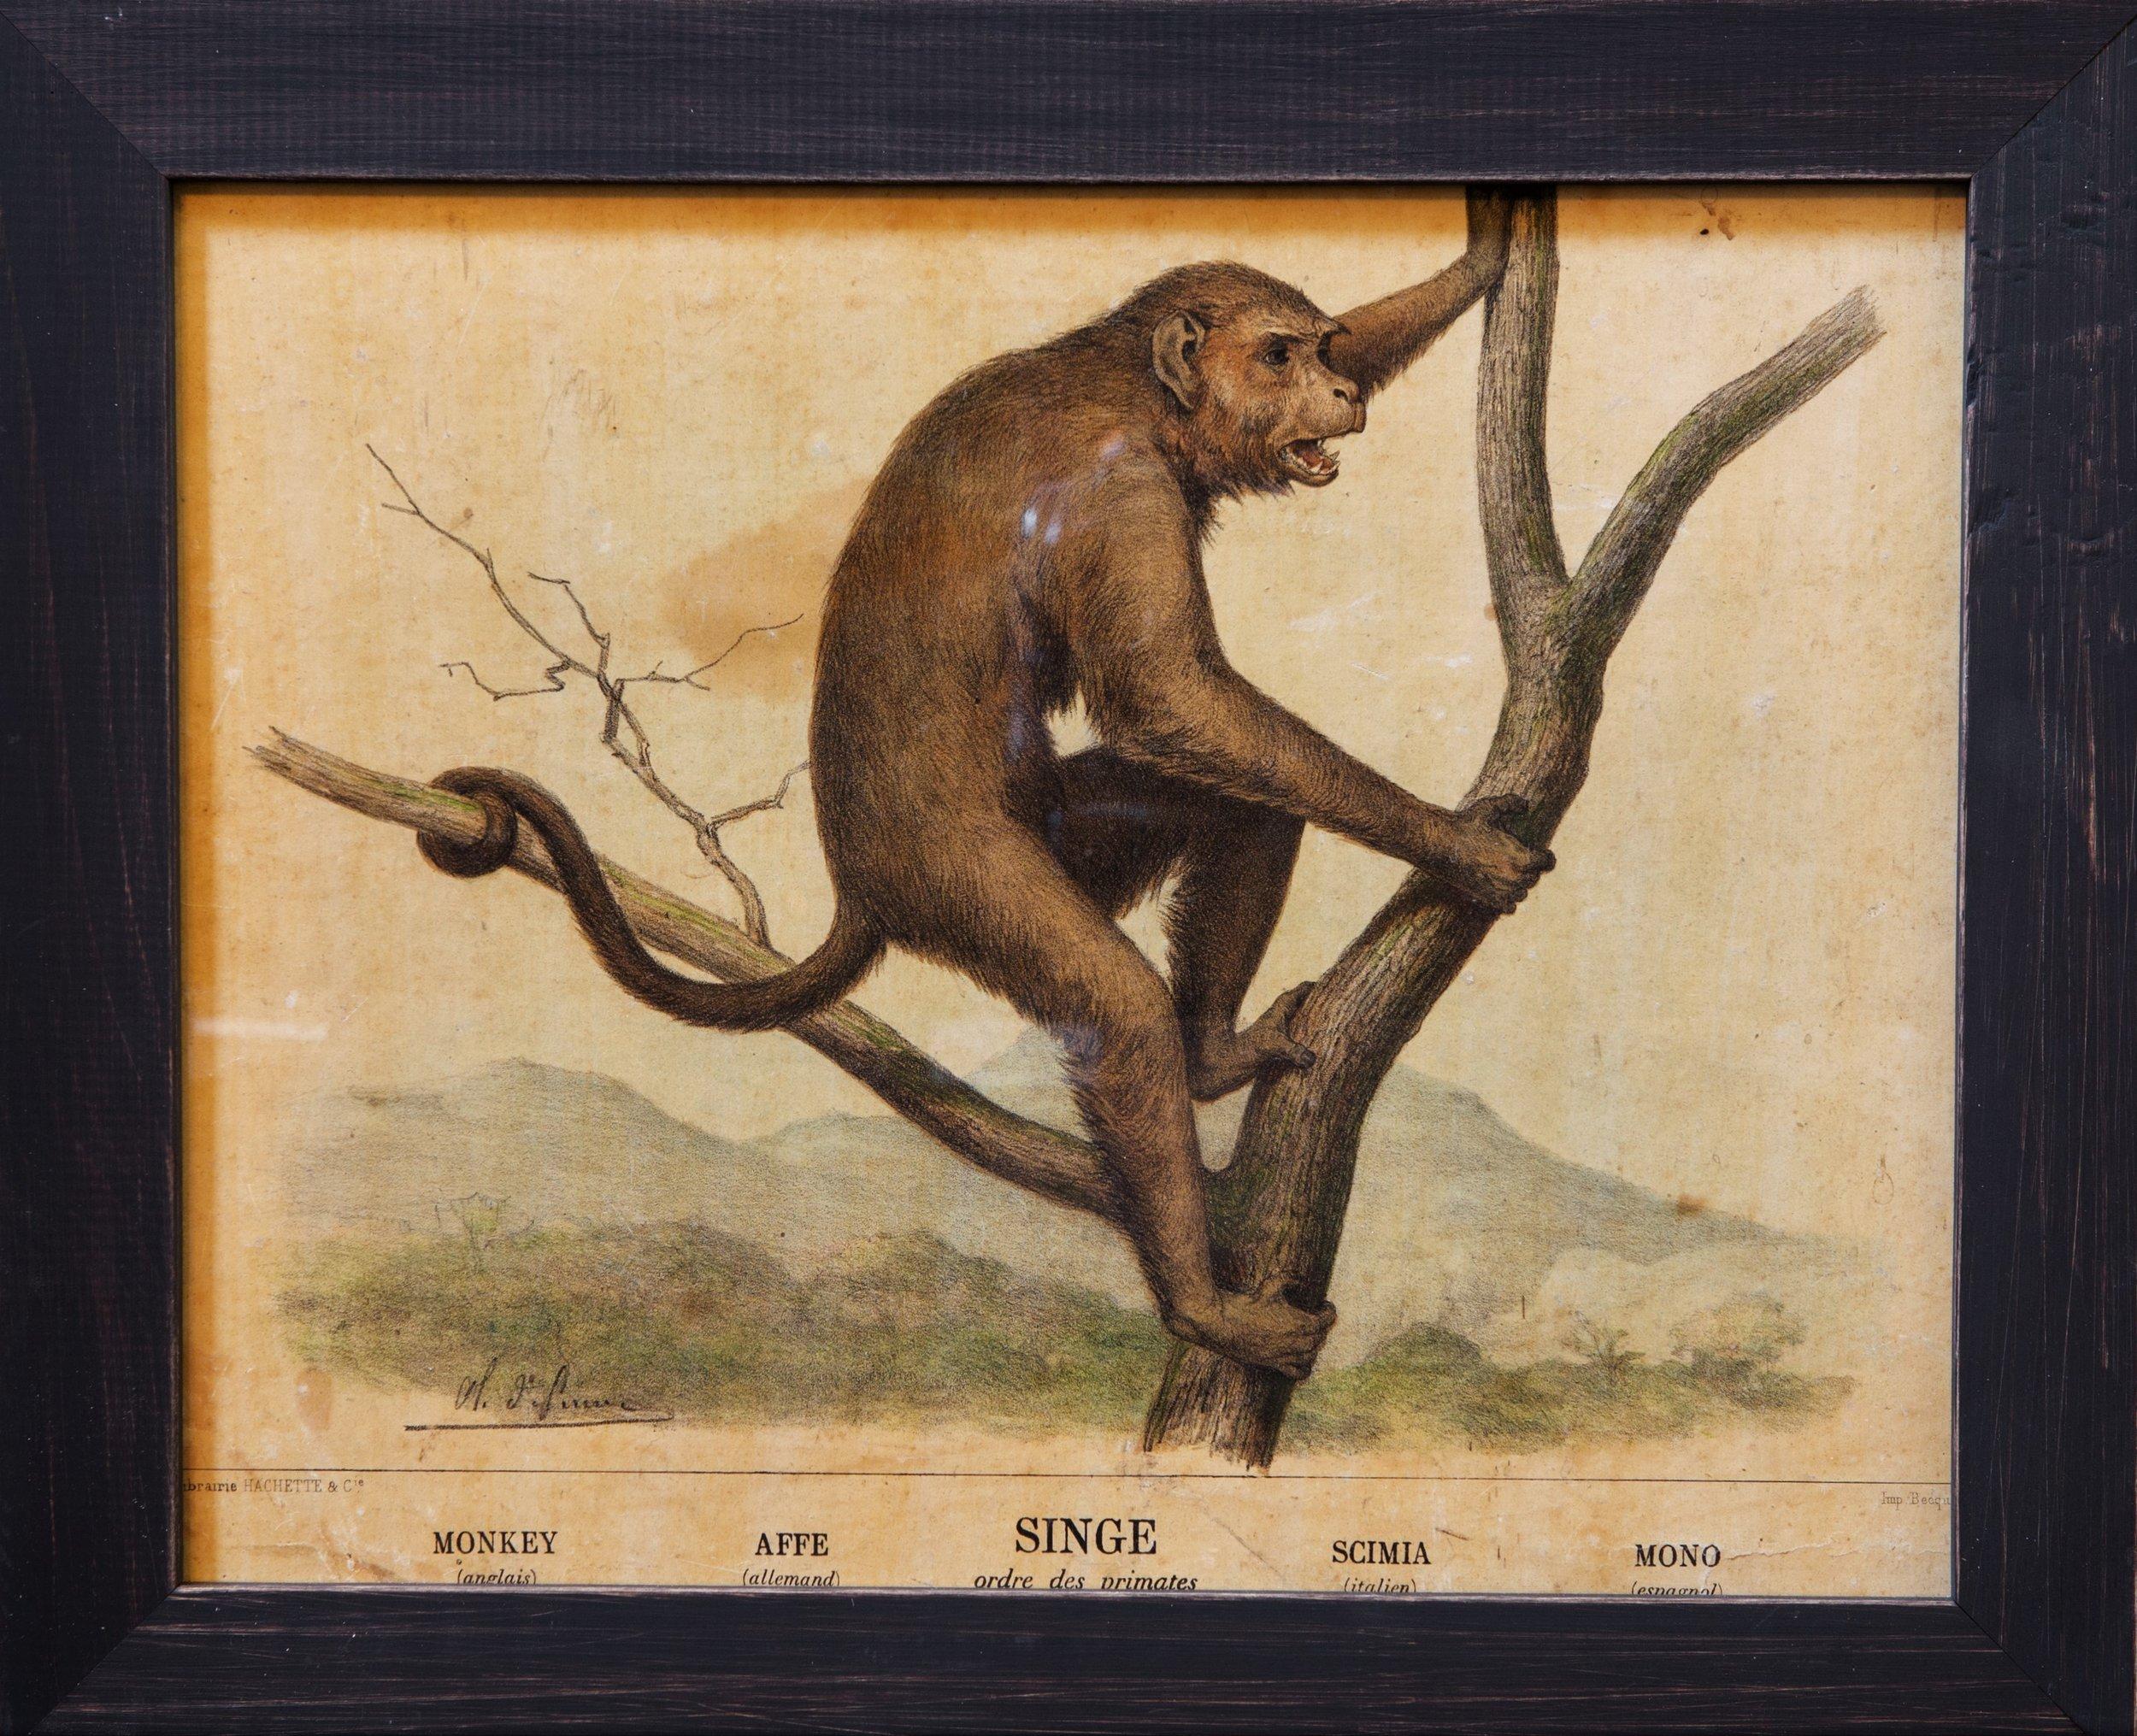 Antique Monkey Print